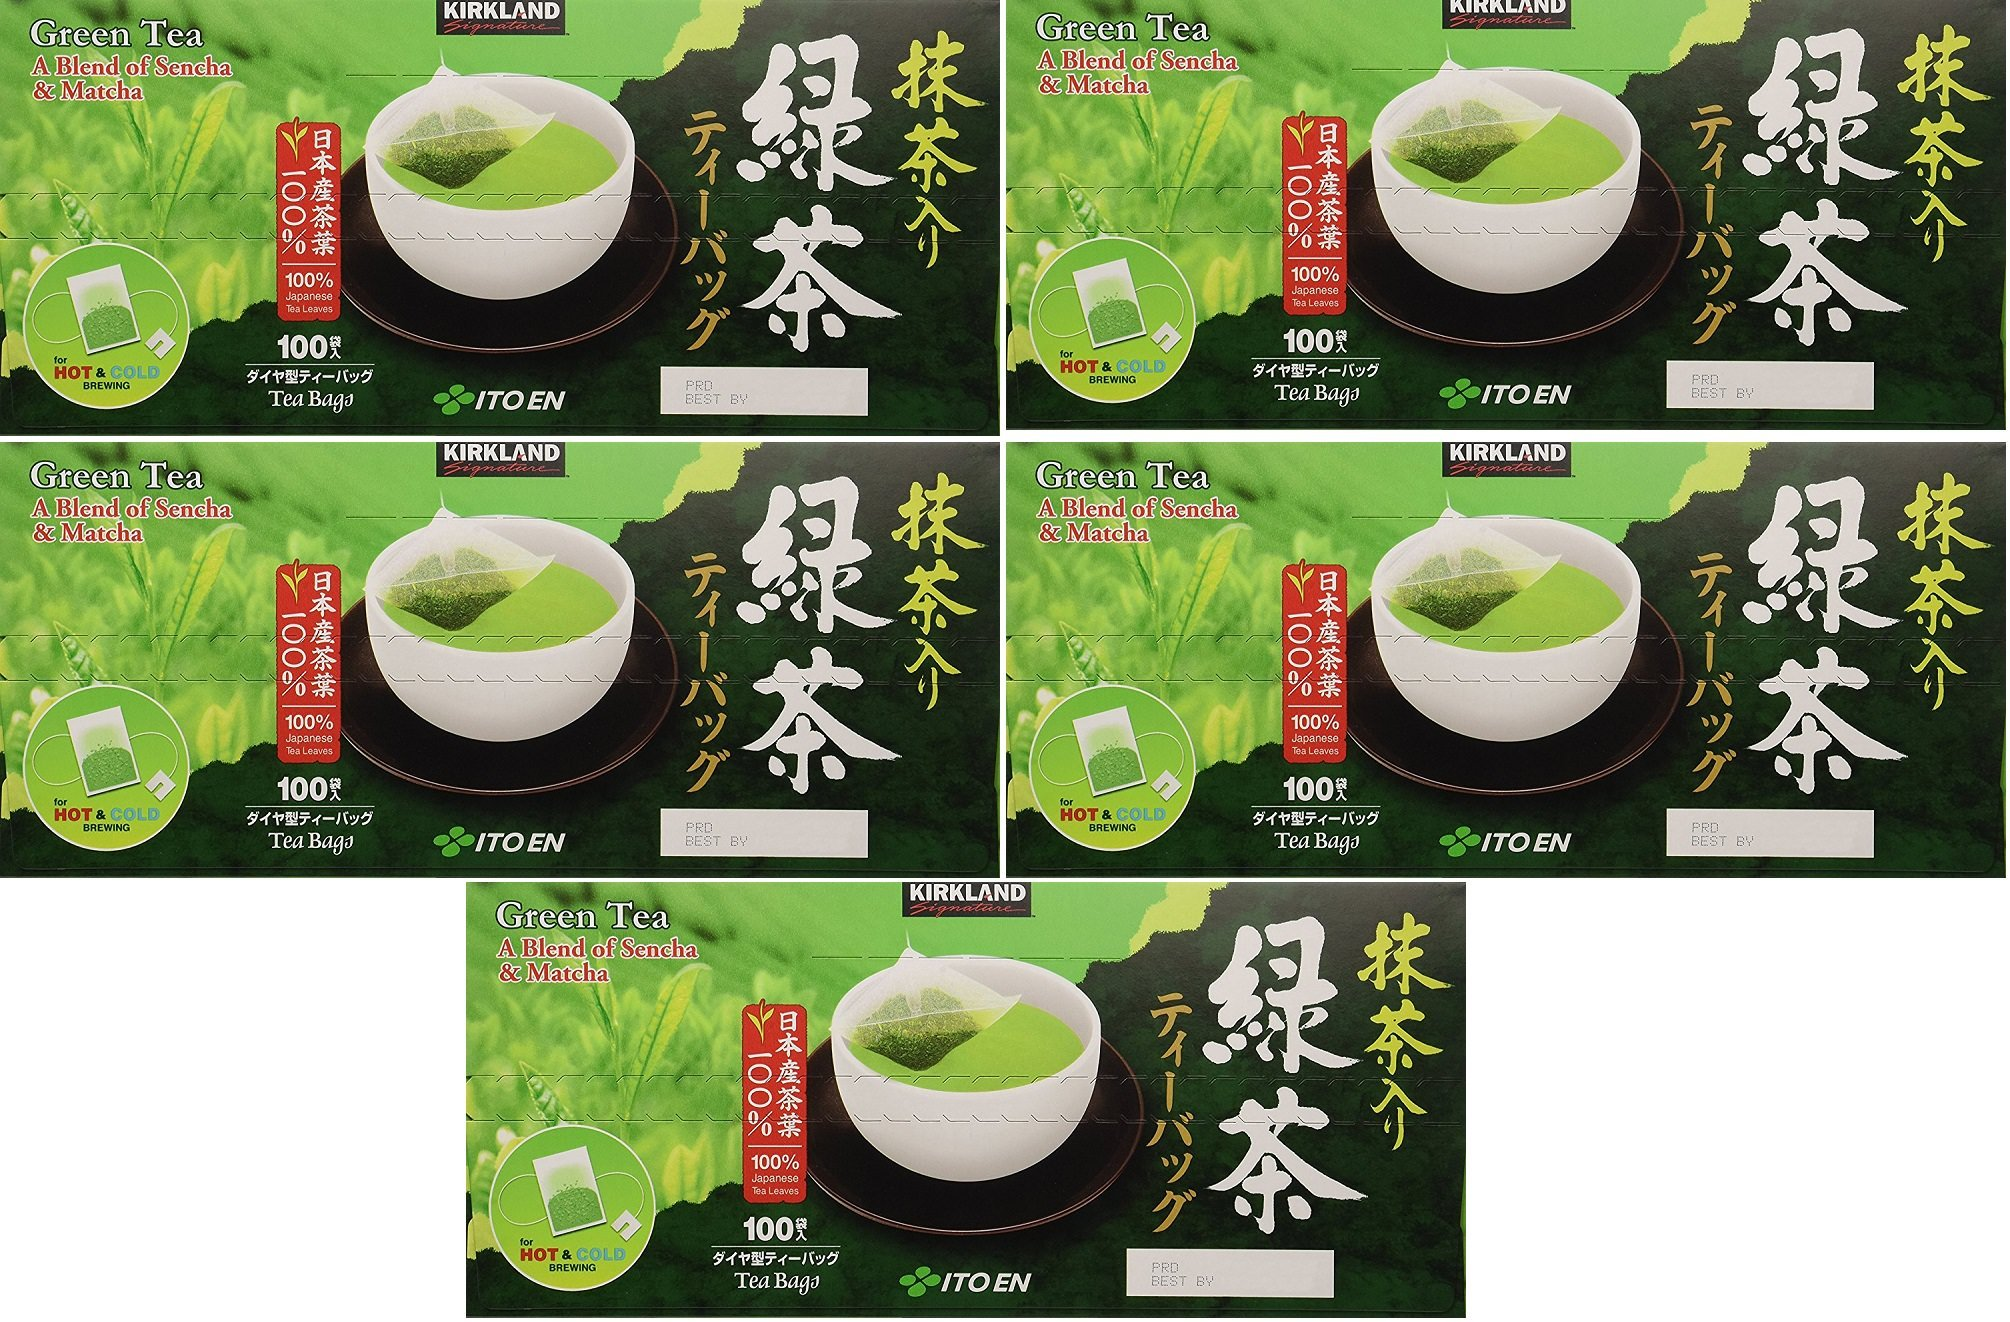 Kirkland Ito En Matcha Blend Japanese Green Tea, 1.5g Tea Bags (500 Count)